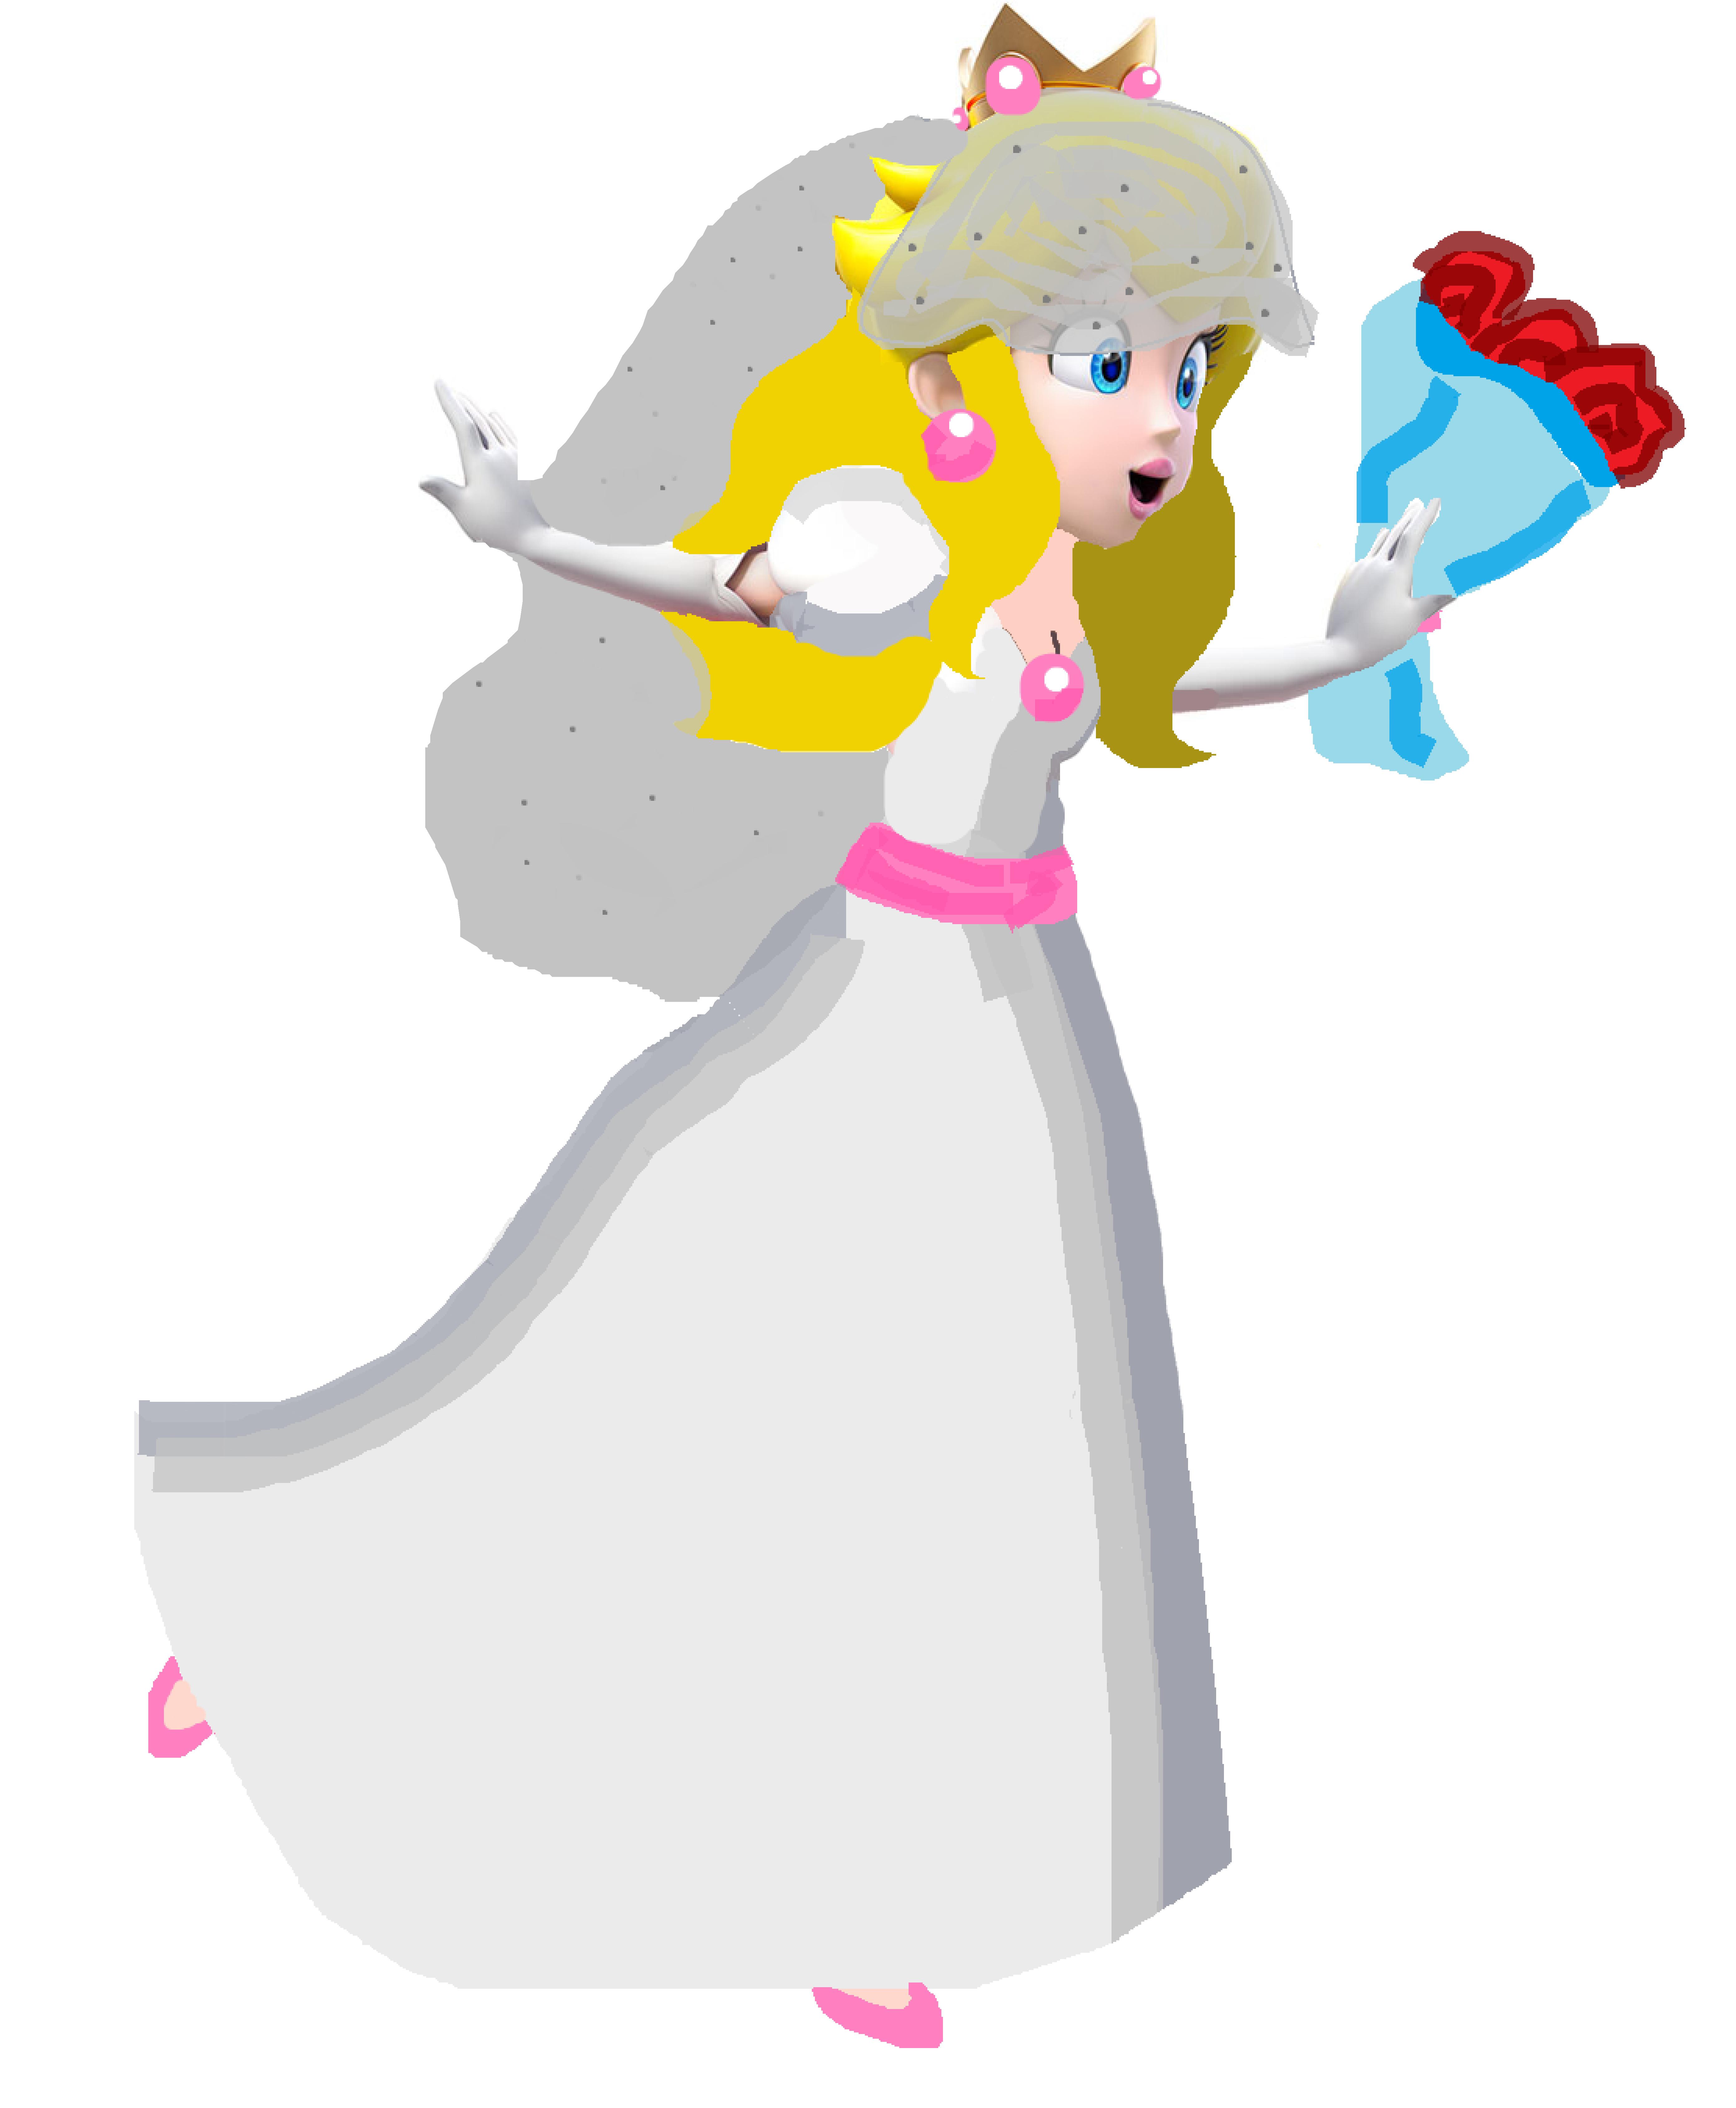 Princess peach wedding dress up discount wedding dresses for Princess peach wedding dress